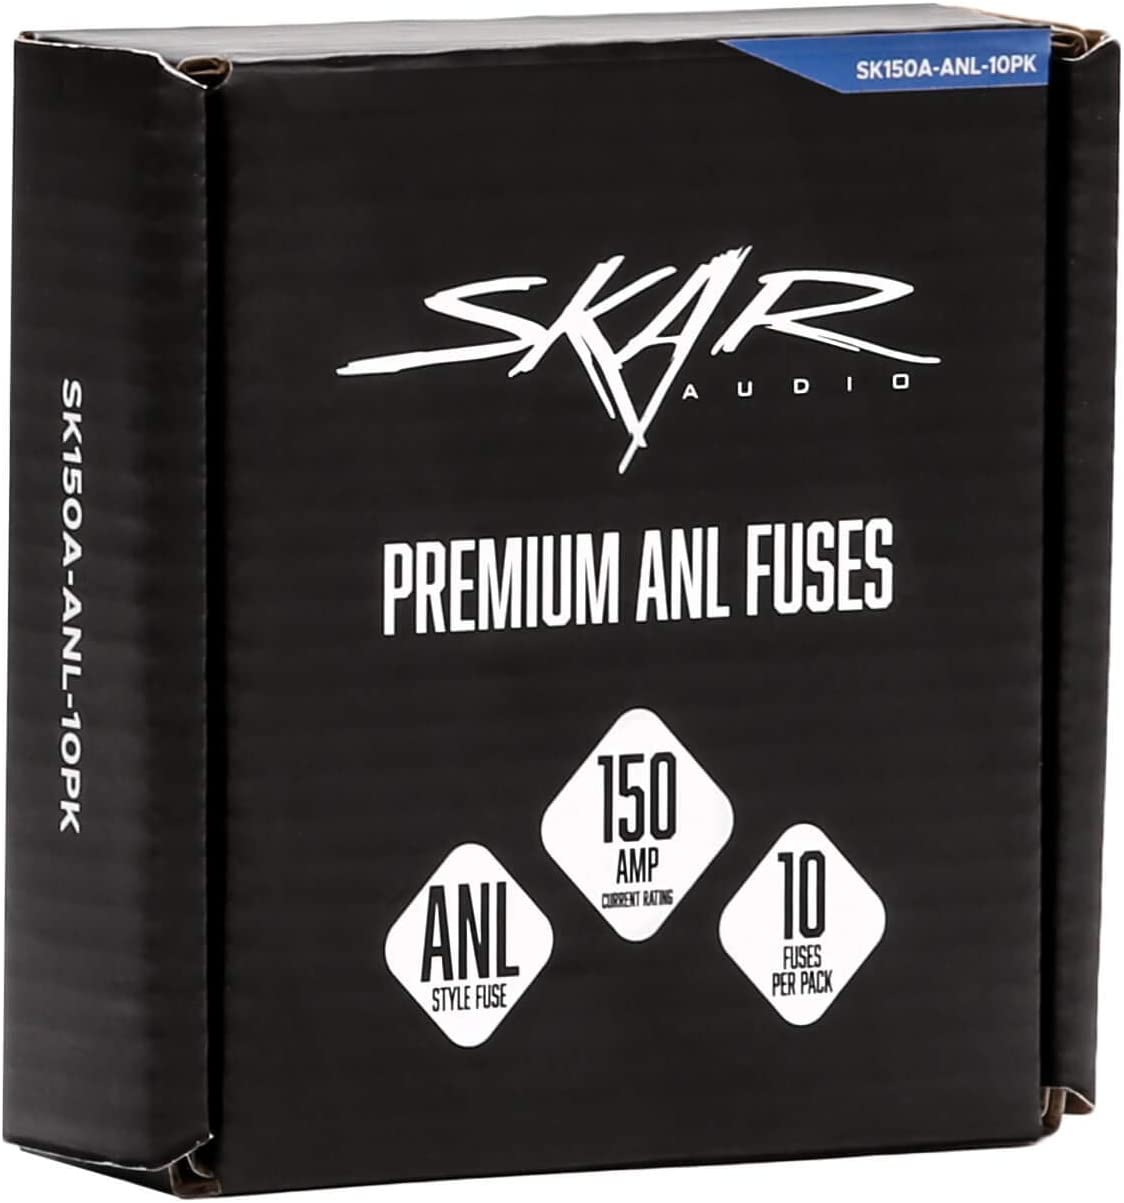 Skar Audio SK250A-ANL-10PK 250 Amp Fuses